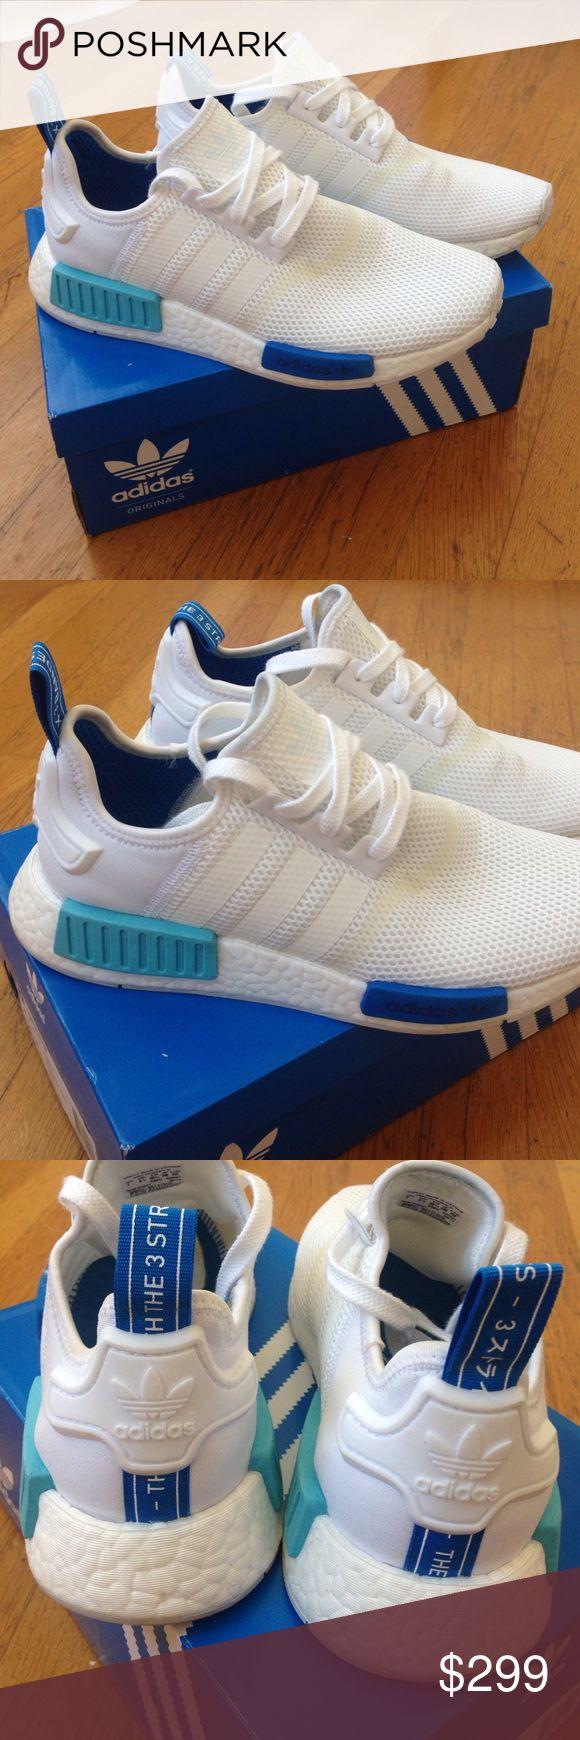 adidas nmd c1 womens Blue